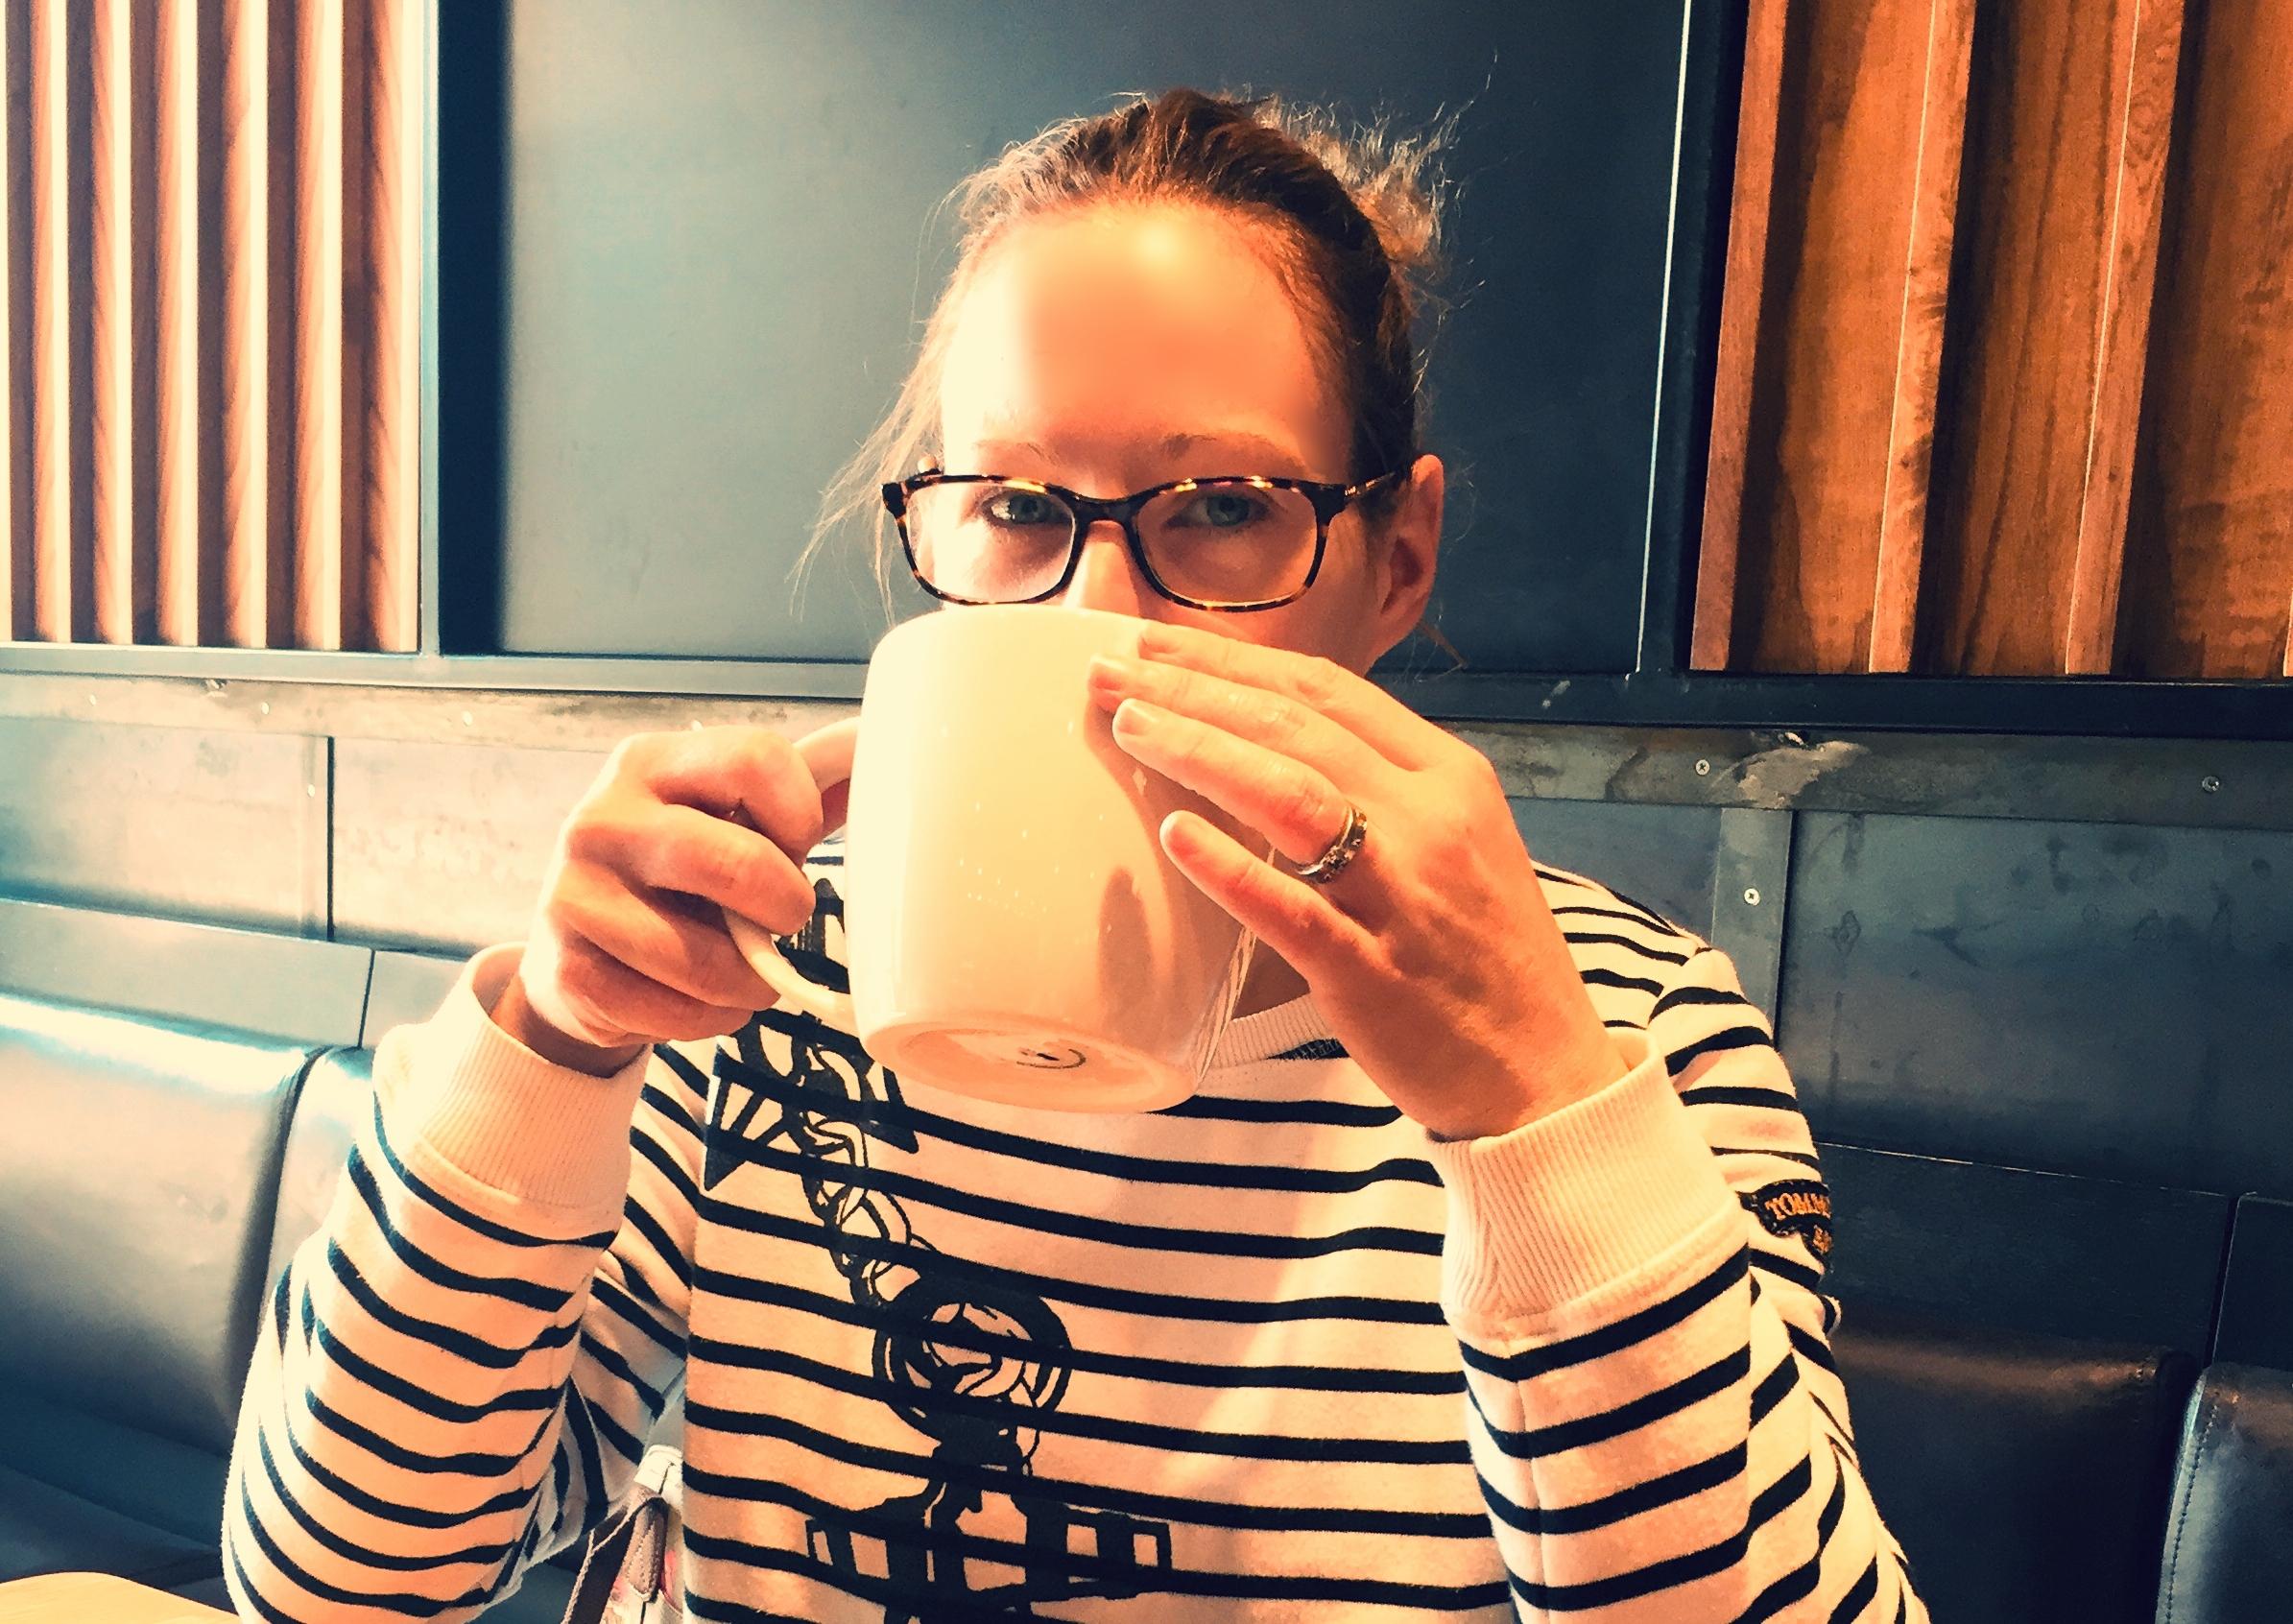 Before making lists, make tea -